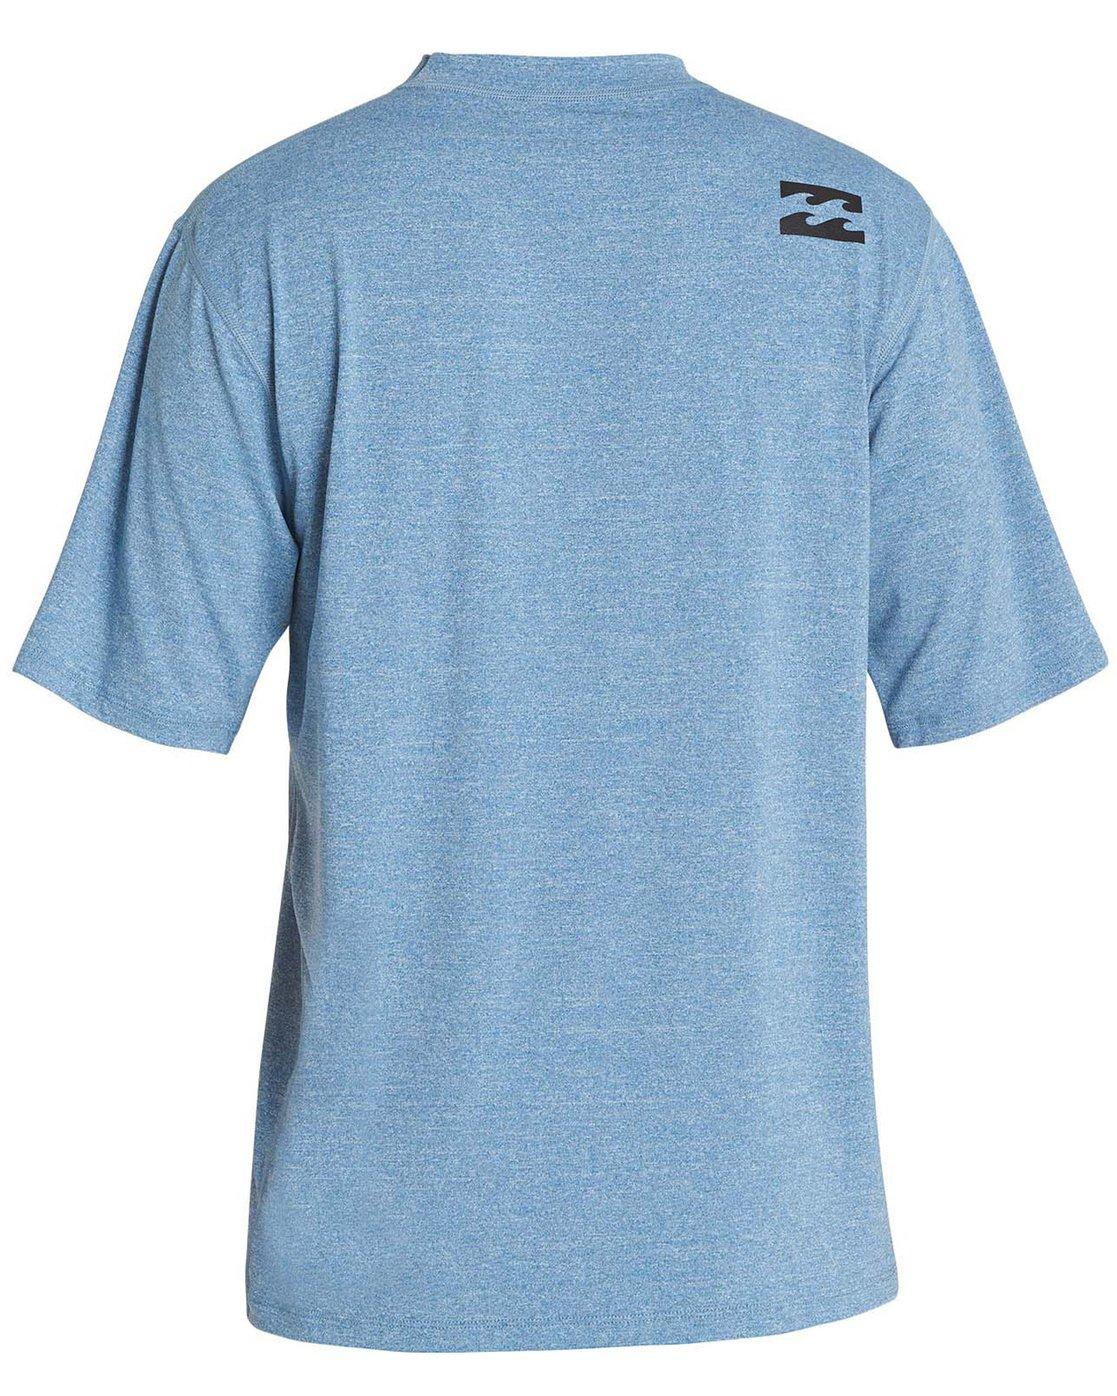 d14753bcf9 1 Boys' All Day Wave Loose Fit Short Sleeve Rashguard Blue BR07NBWL  Billabong